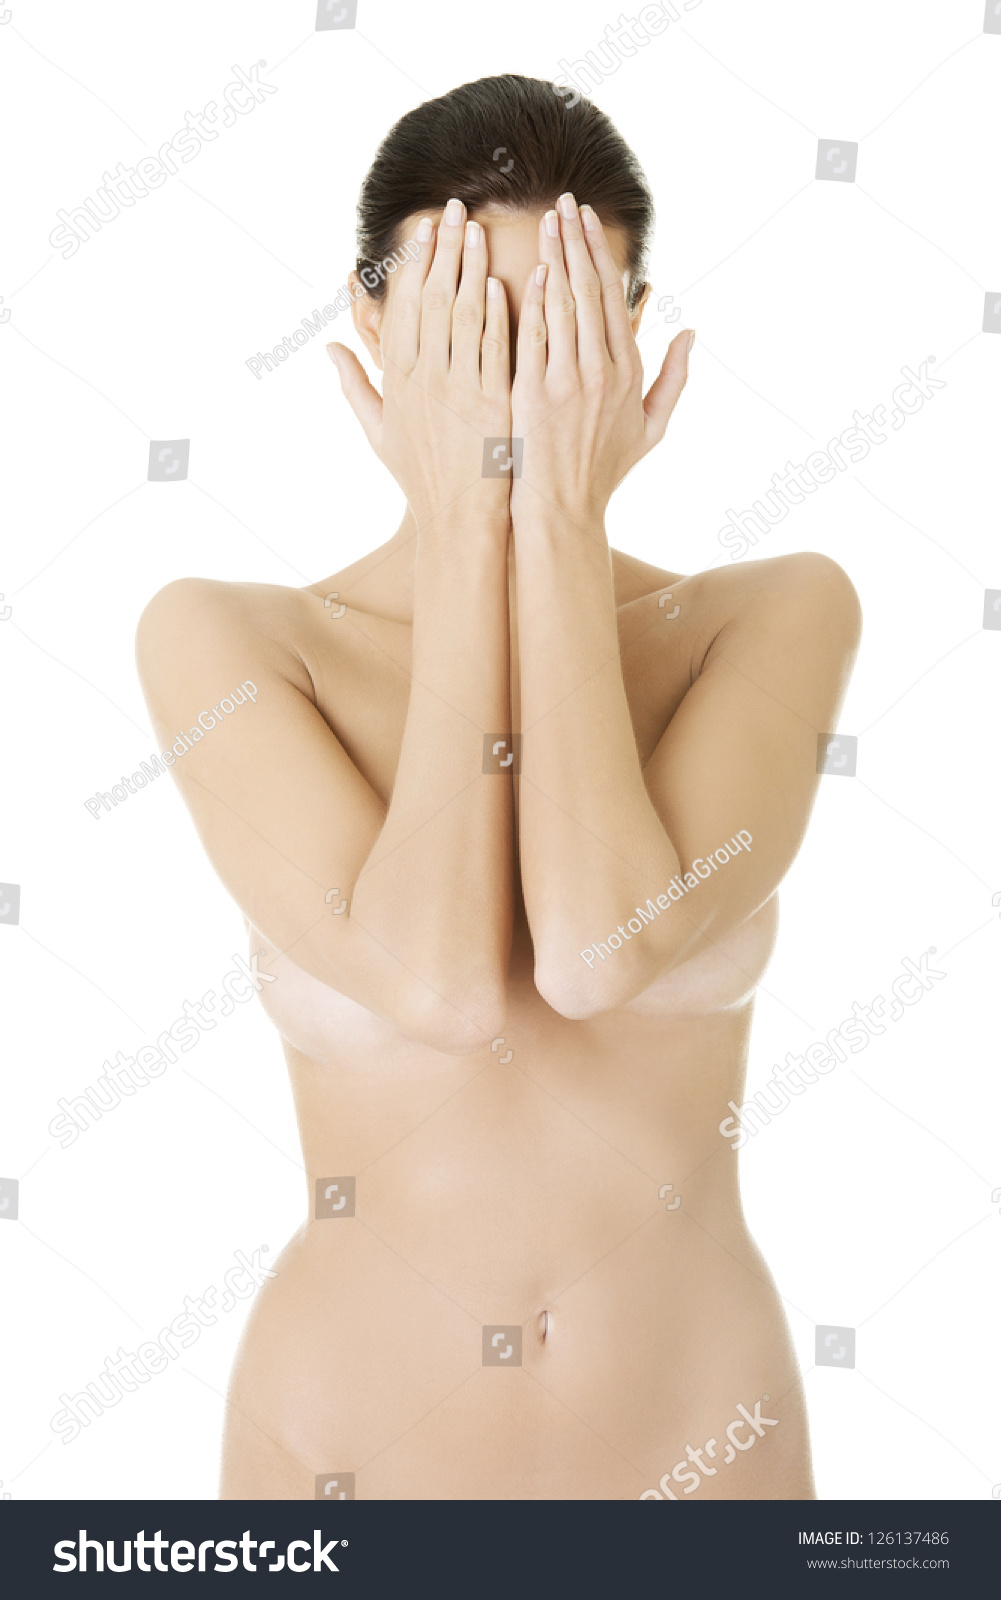 Litlle girl peeing